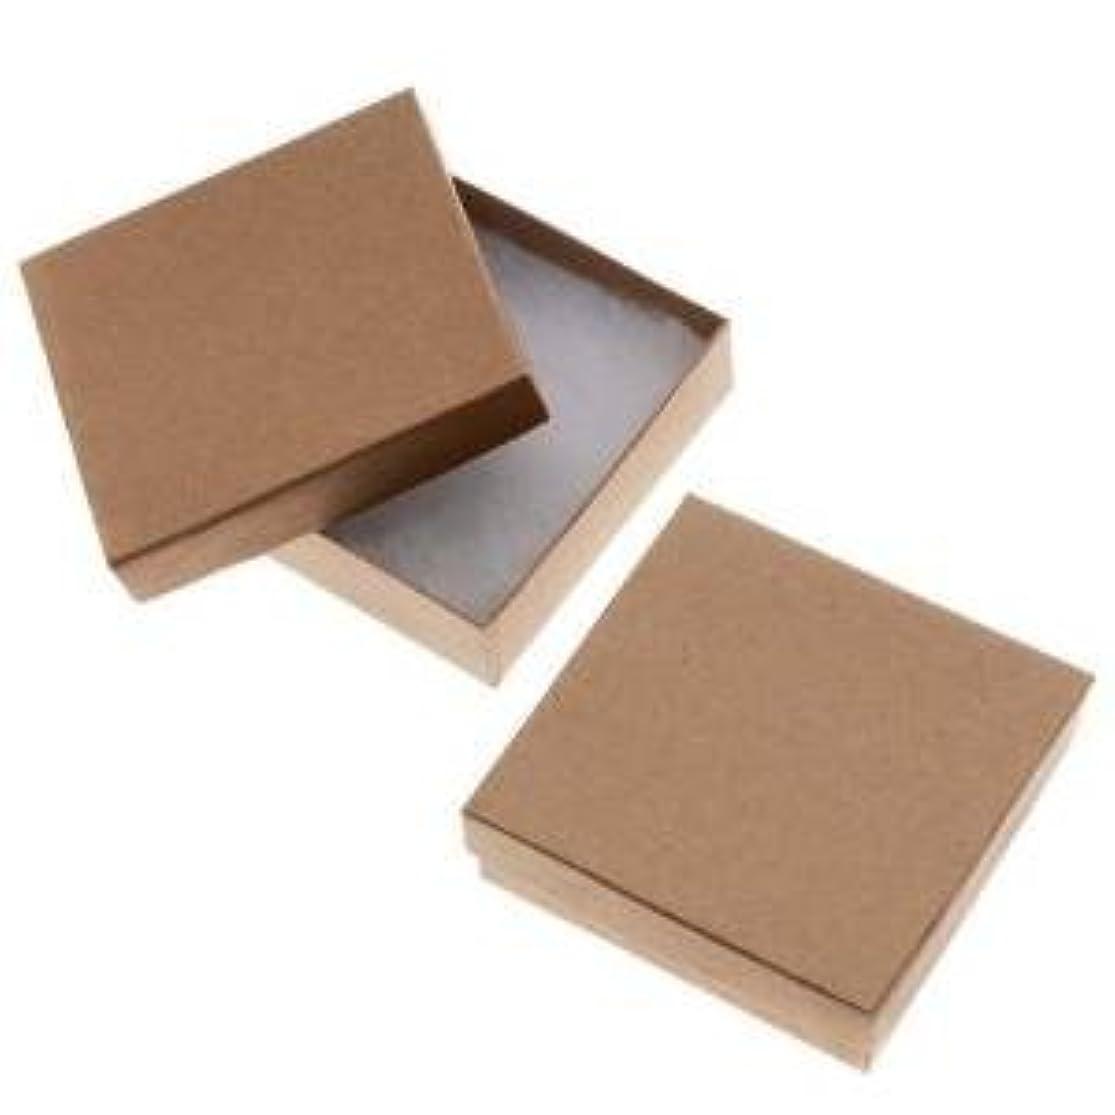 20 Pack Kraft 3.5 X 3.5 X 1 Inch Size Cotton Filled Jewelry Presentation Gift Boxes bdcvznei4